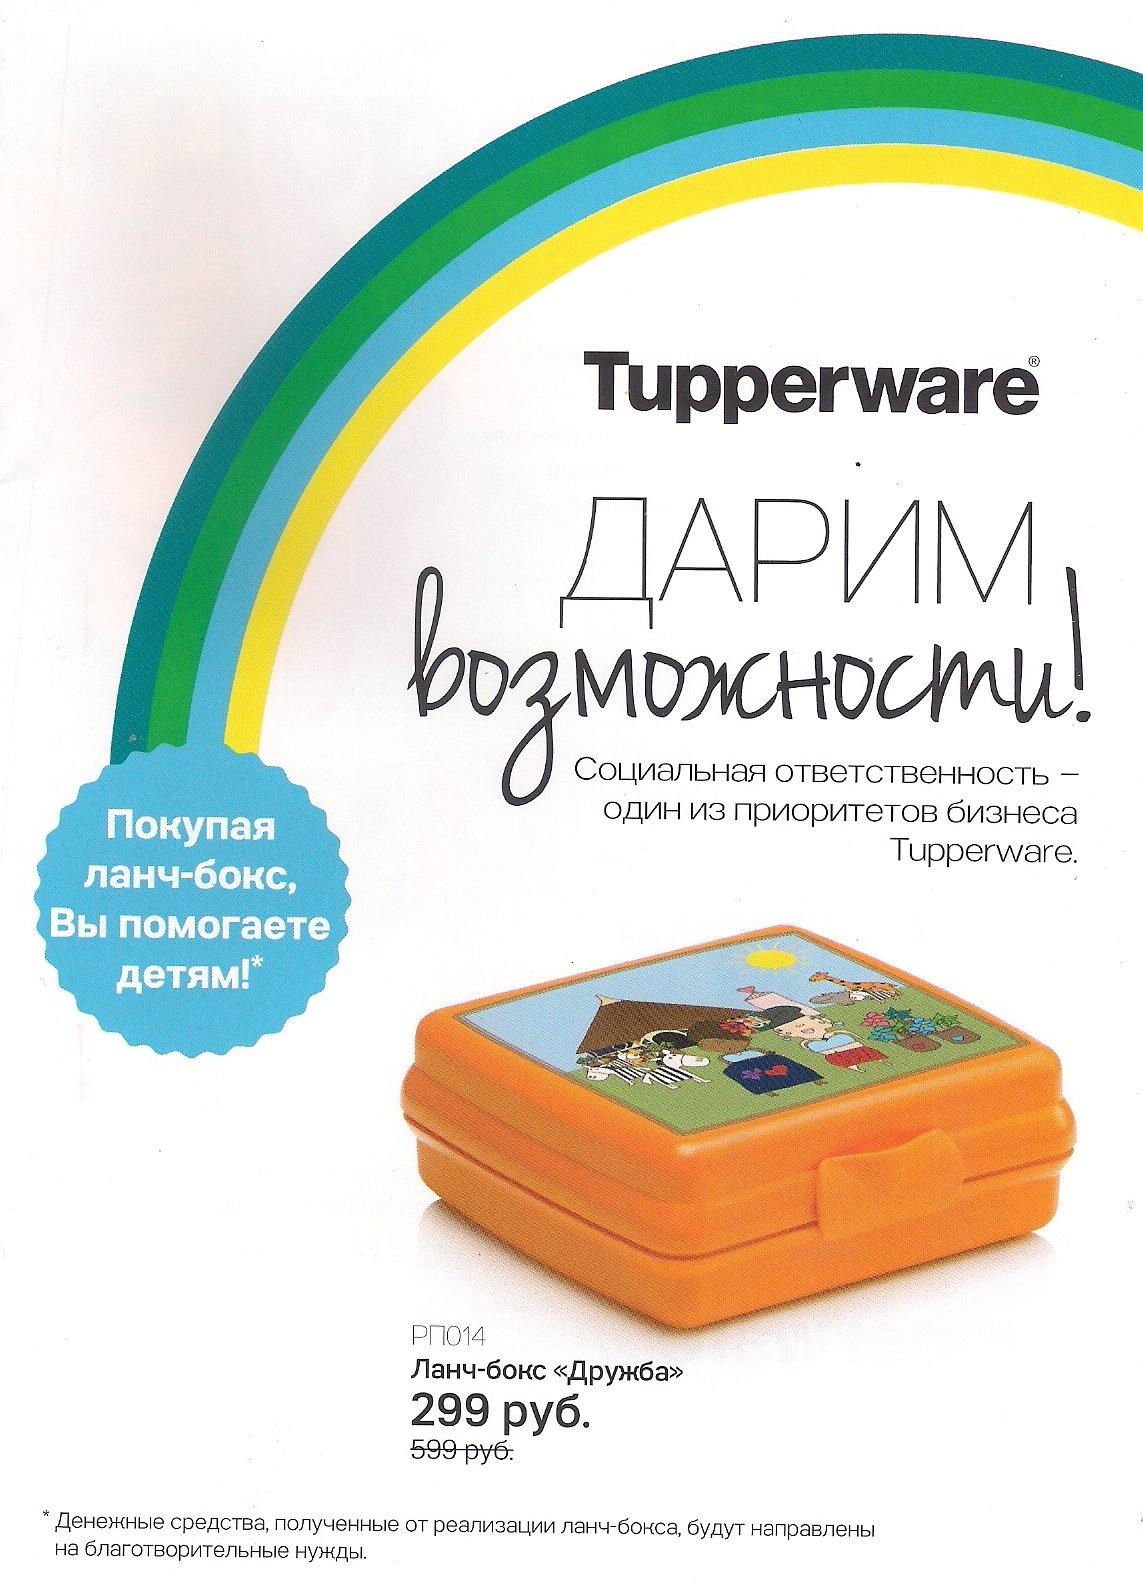 https://tupperware-online.ru/images/upload/22g.jpg